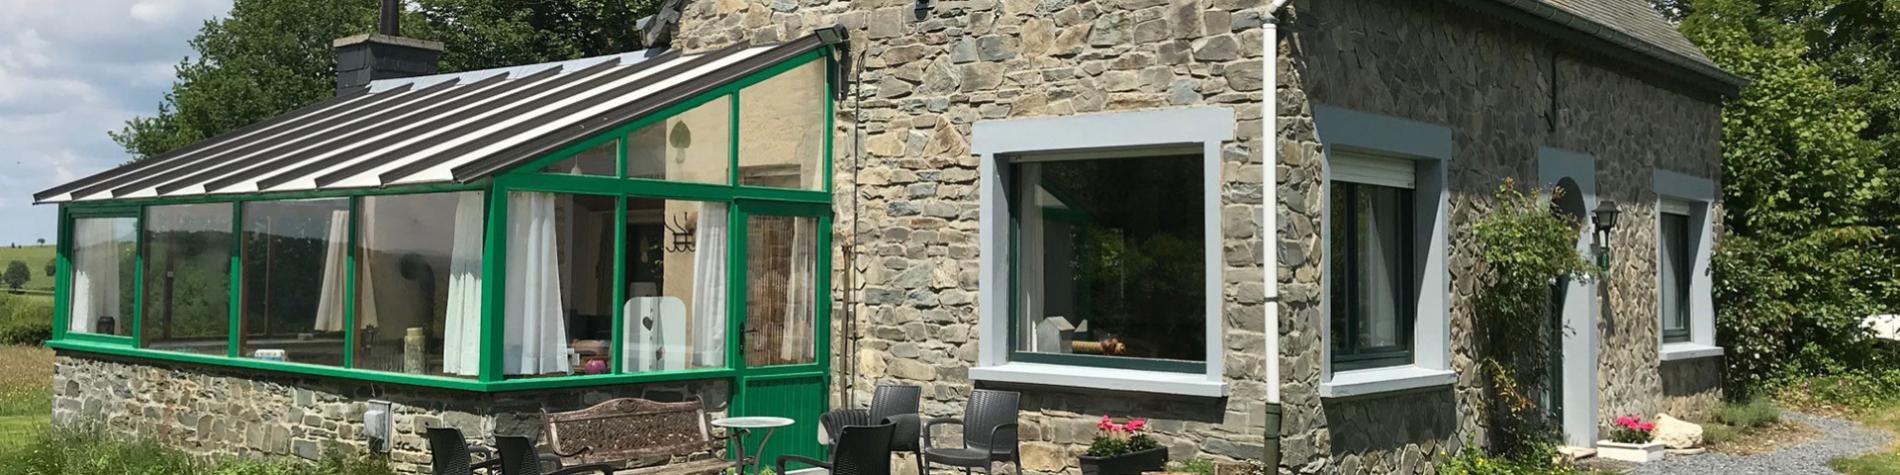 gîte rural - petite maison - chernaudame - auby